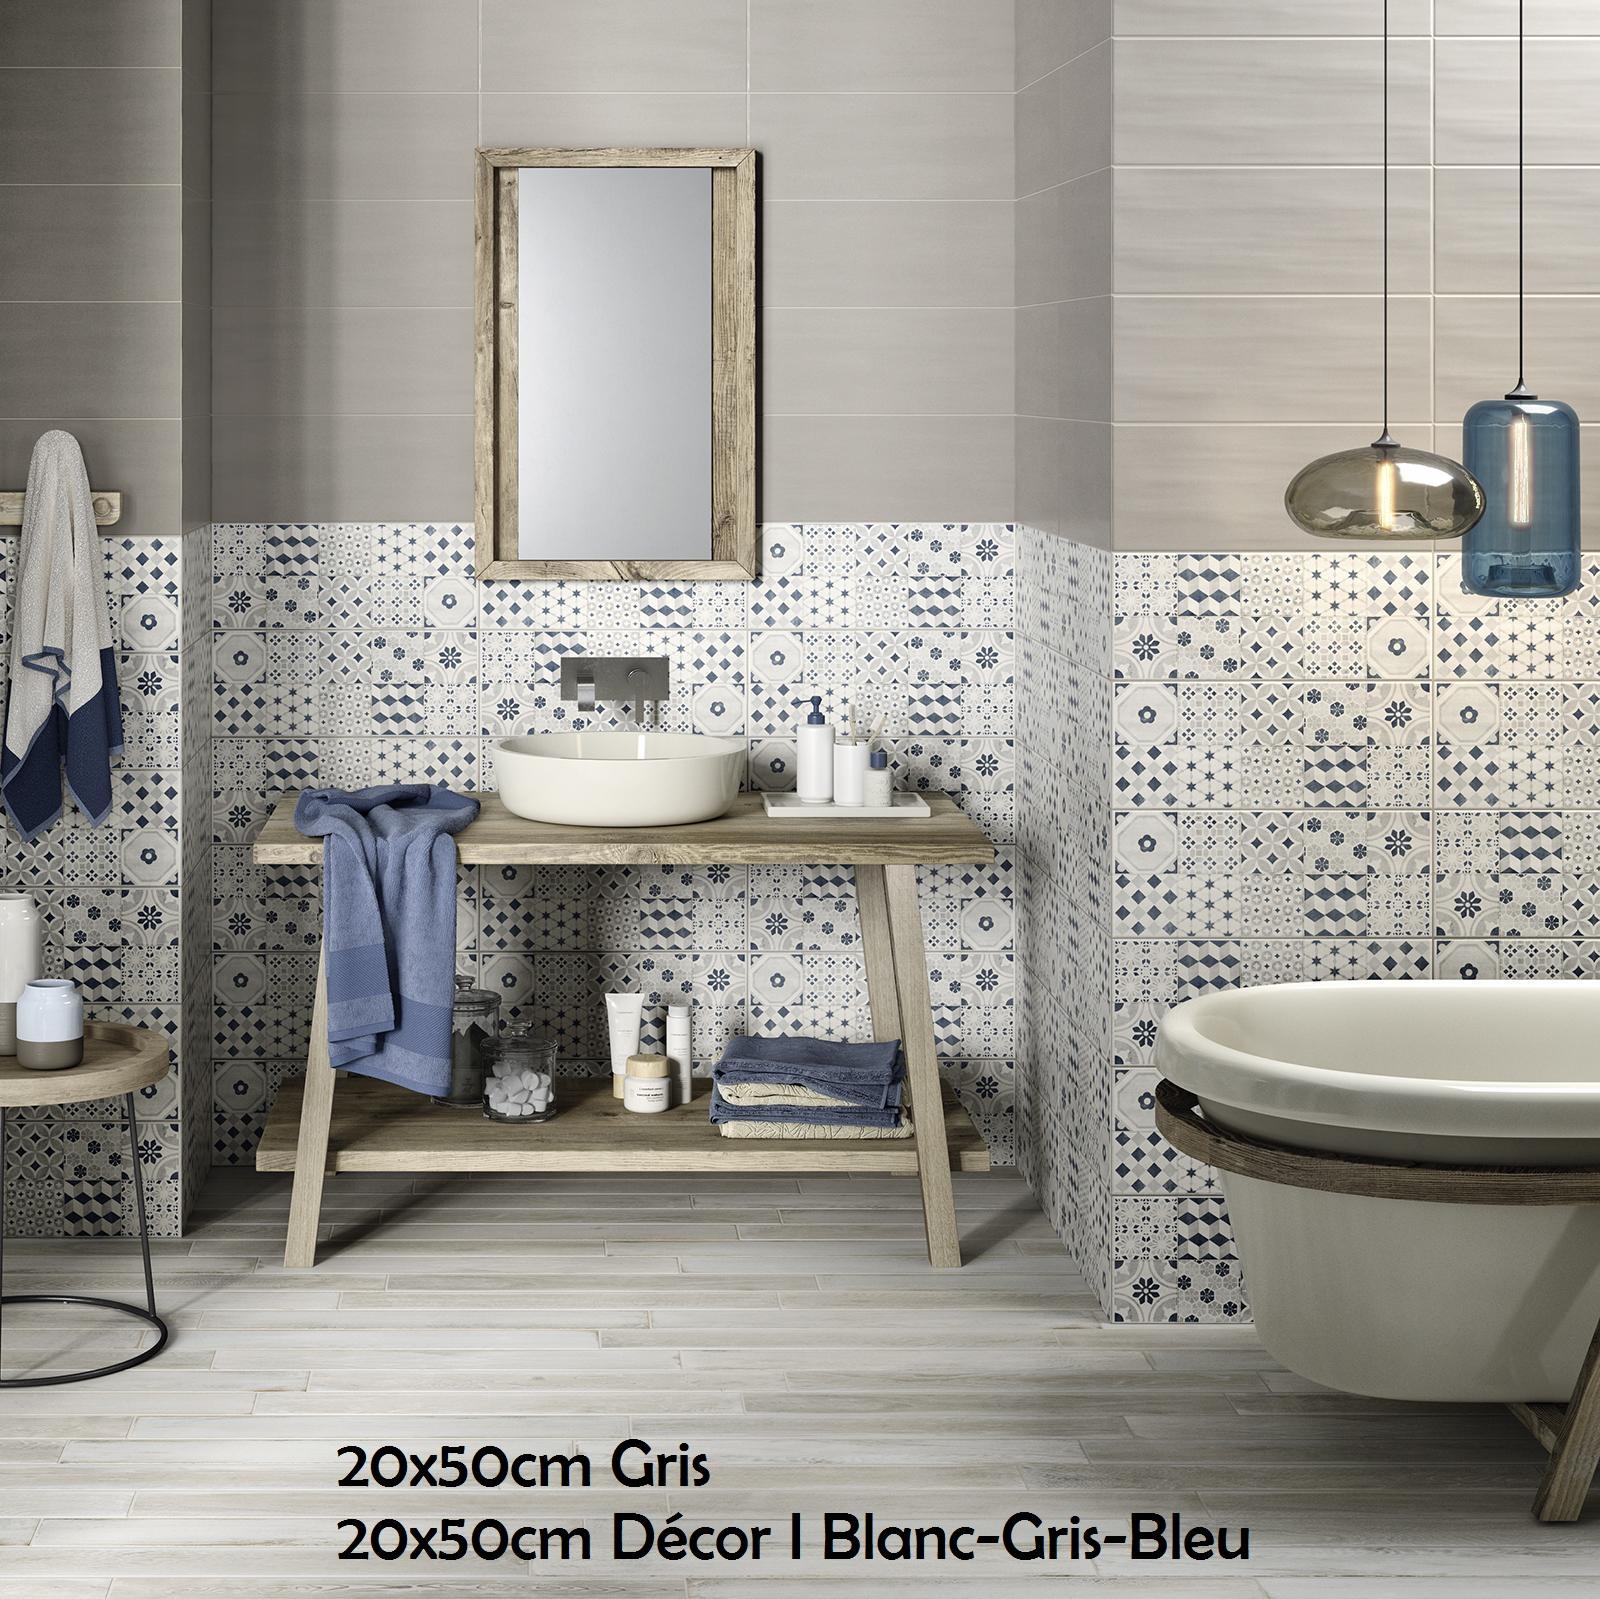 20x50 cm decor i blanc gris bleu